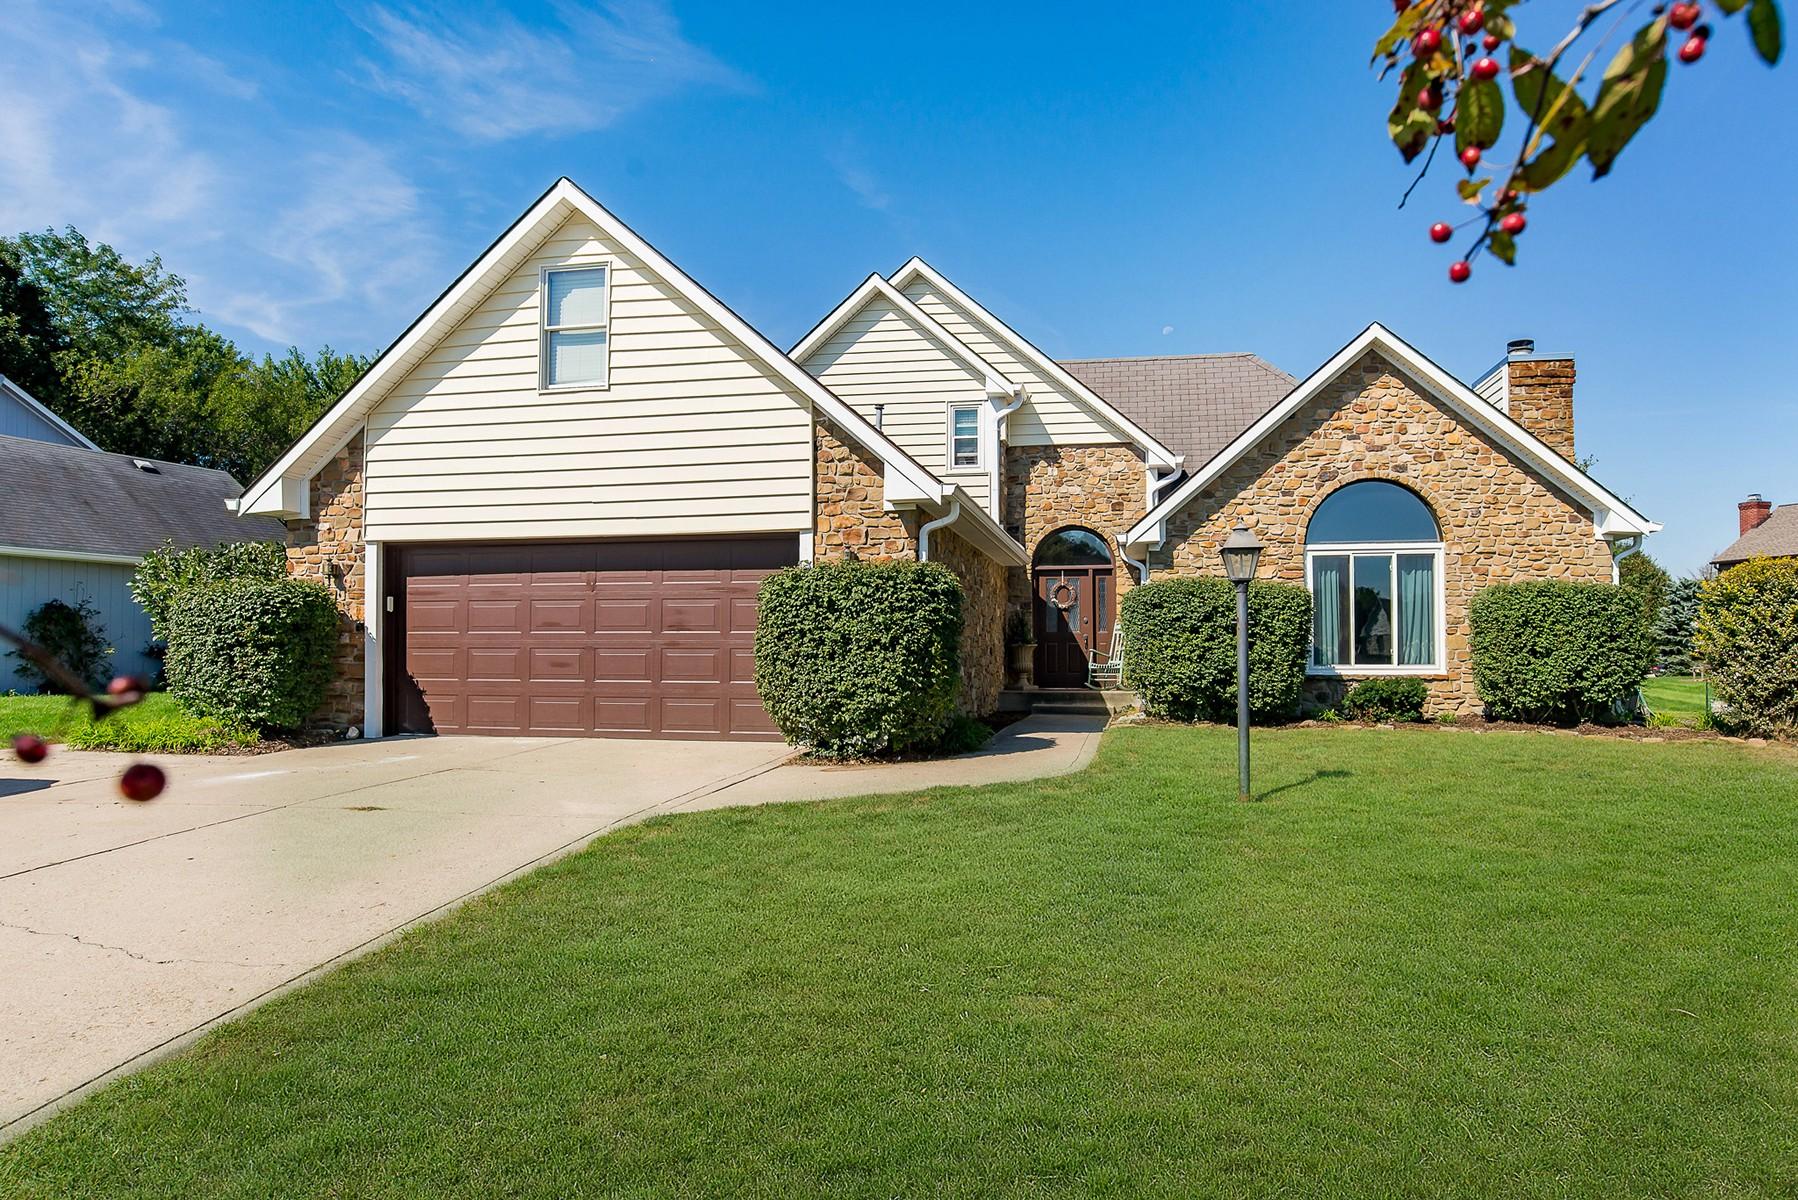 Single Family Home for Sale at Fabulous Home! 1724 Sunrise Circle Indianapolis, Indiana, 46229 United States